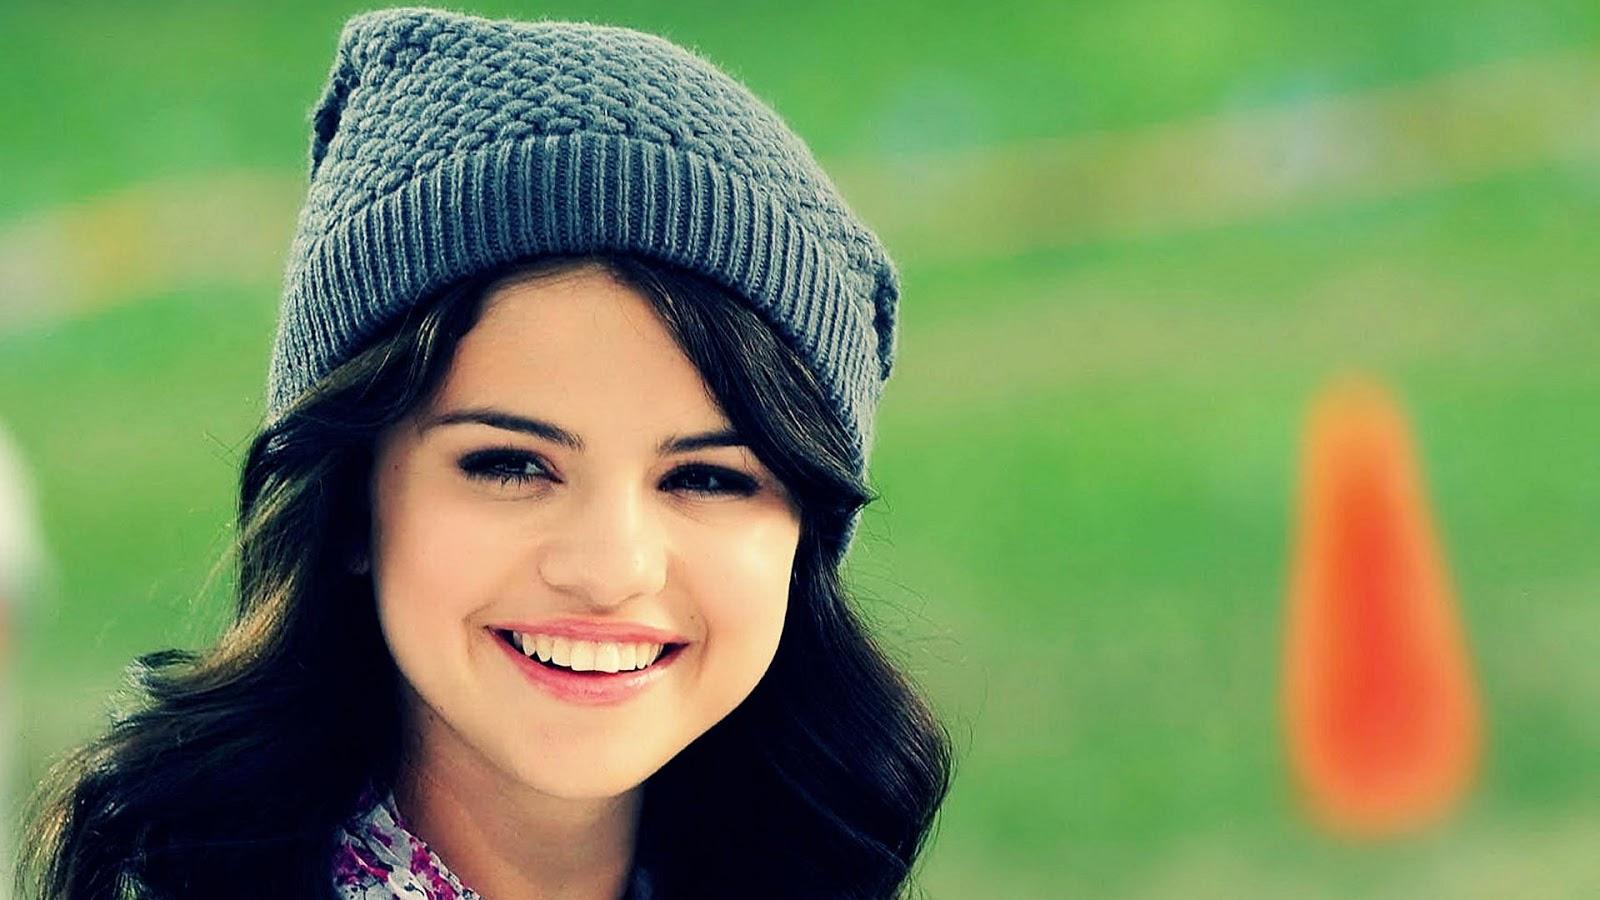 For You (álbum de Selena Gomez) - Wikipedia, la